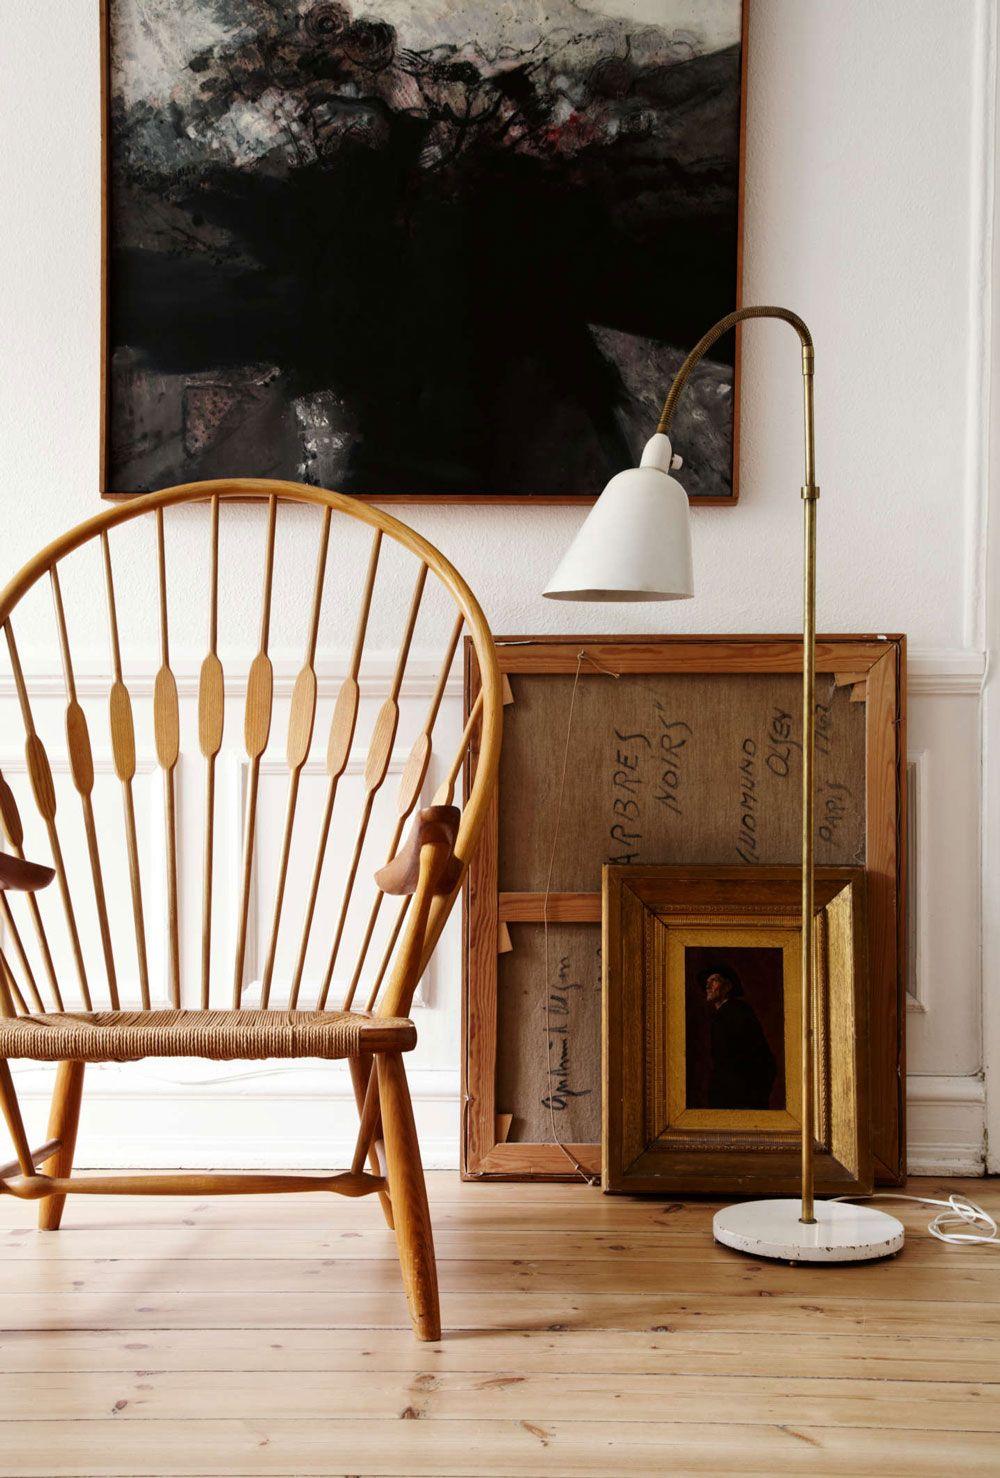 The Beautiful Copenhagen Home Of A Vintage Scandinavian Design Collector Nordic Design Scandinavian Furniture Contemporary Home Decor Living Room Scandinavian